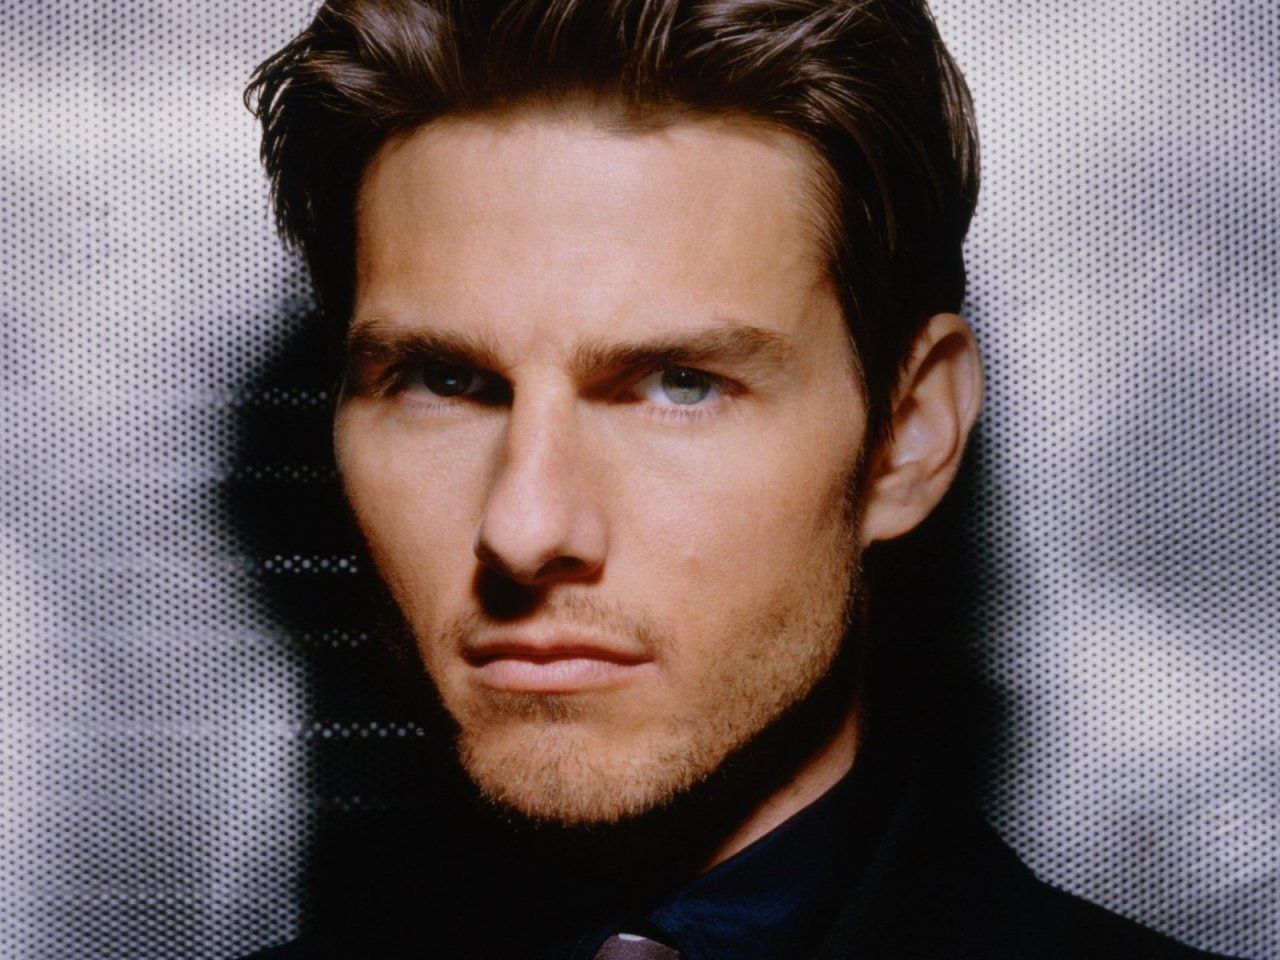 Tom Cruise Hd Wallpaper 3270 1280x960 px HDWallSourcecom 1280x960